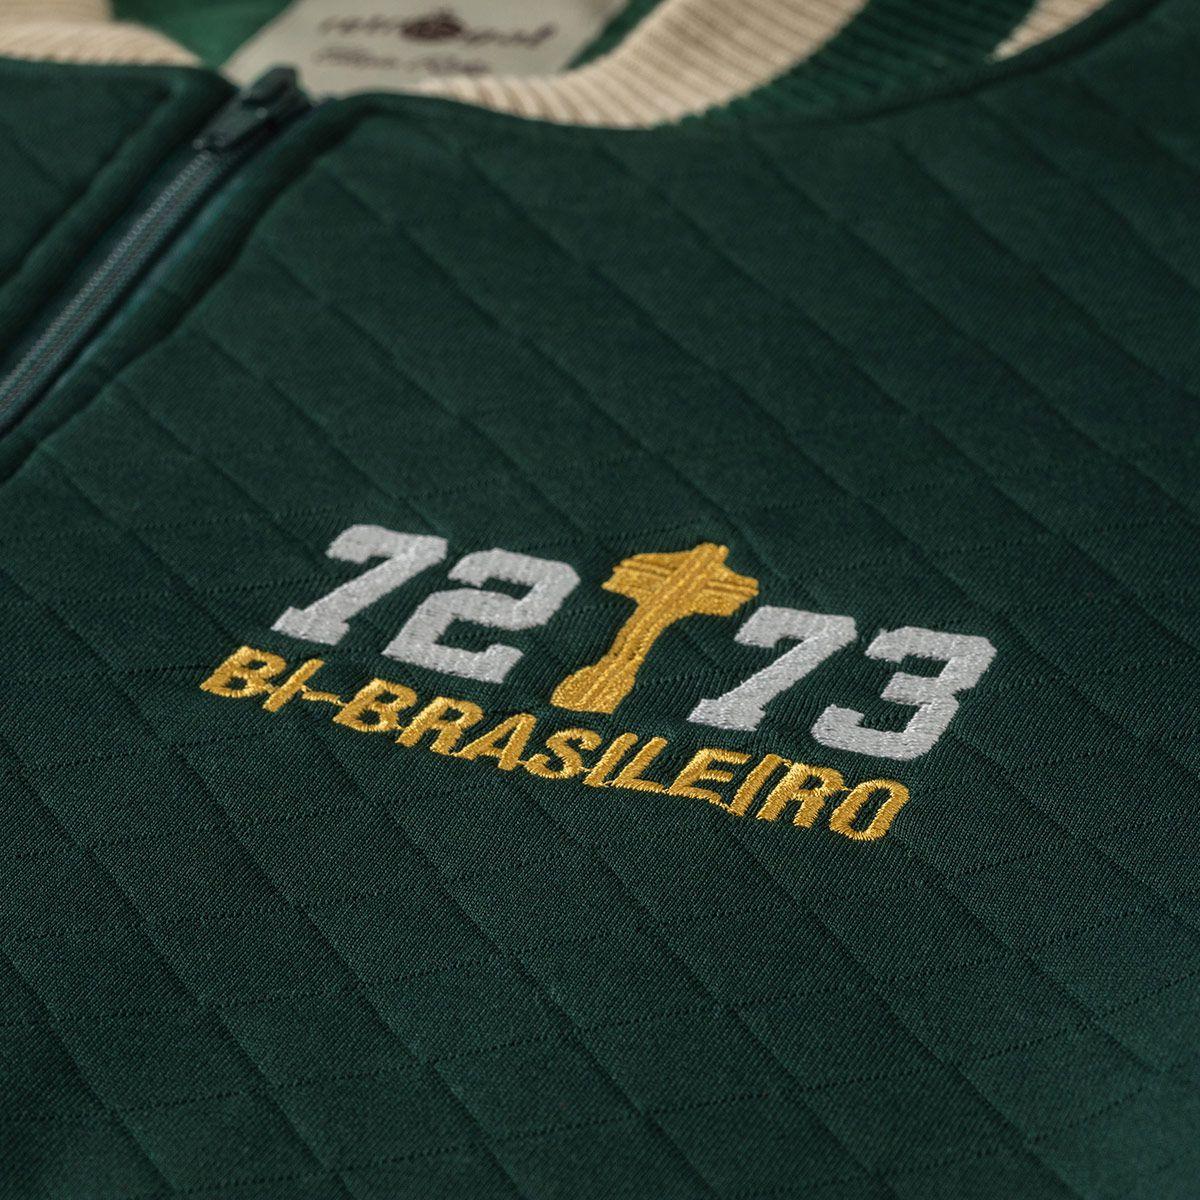 Jaqueta Palmeiras Ademir Retrô Gol Classic Masculina